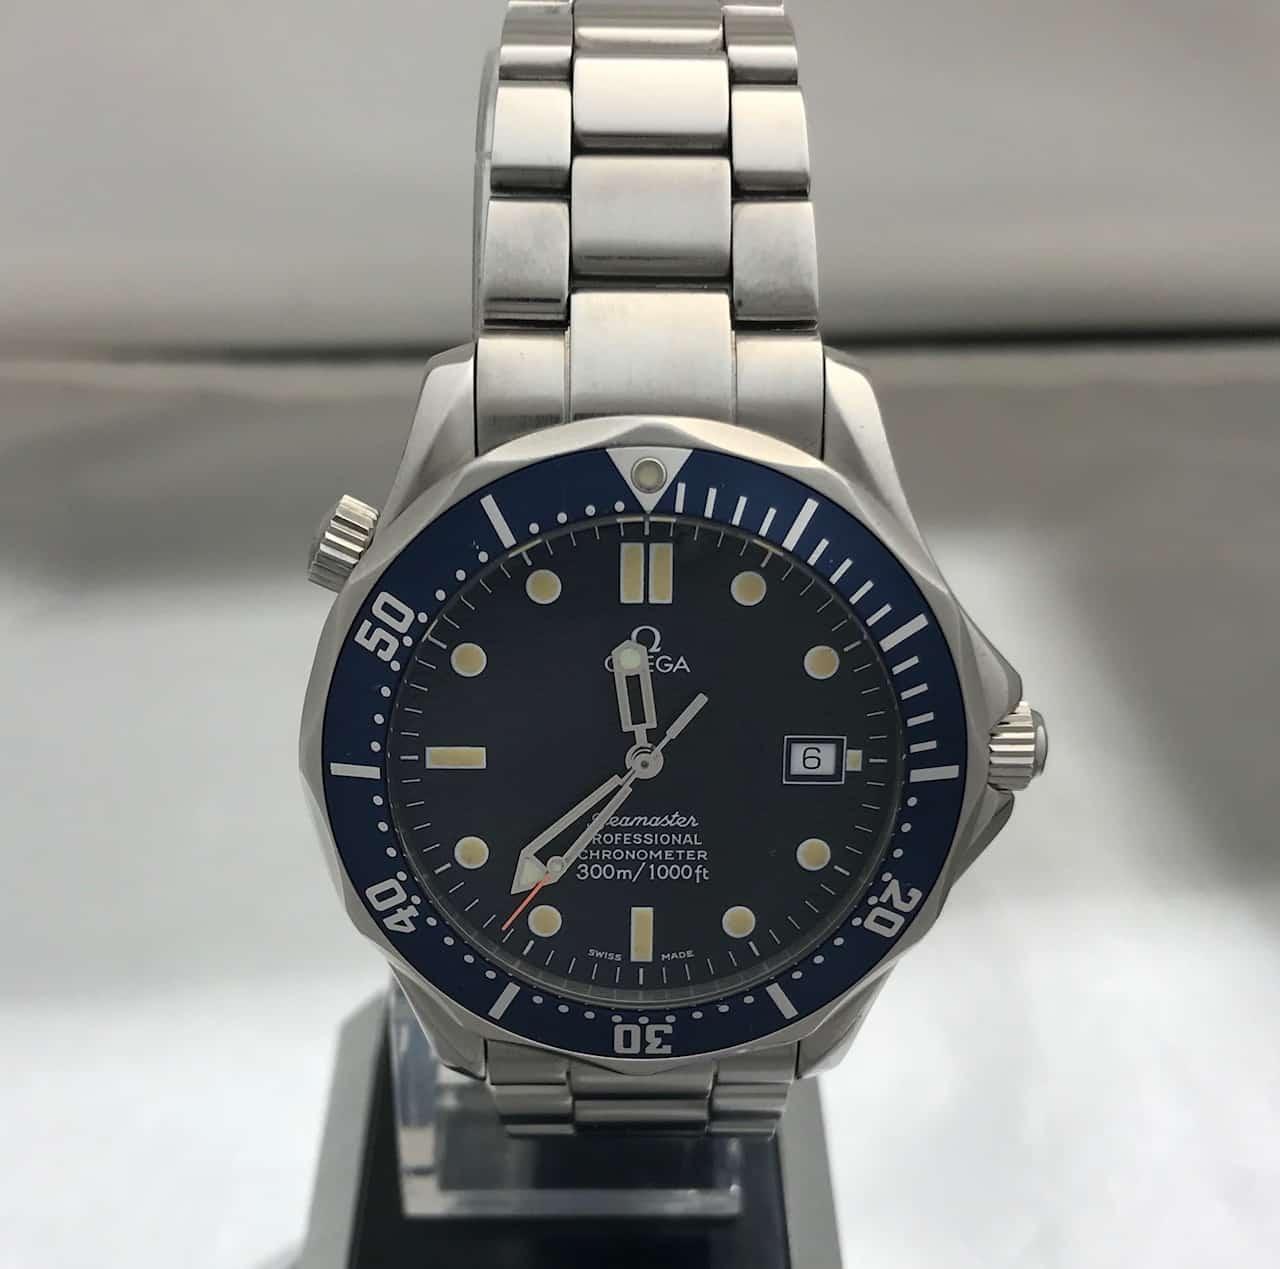 9edce39974de Men s Omega Seamaster Professional Watch - Dublin Village Jewelers